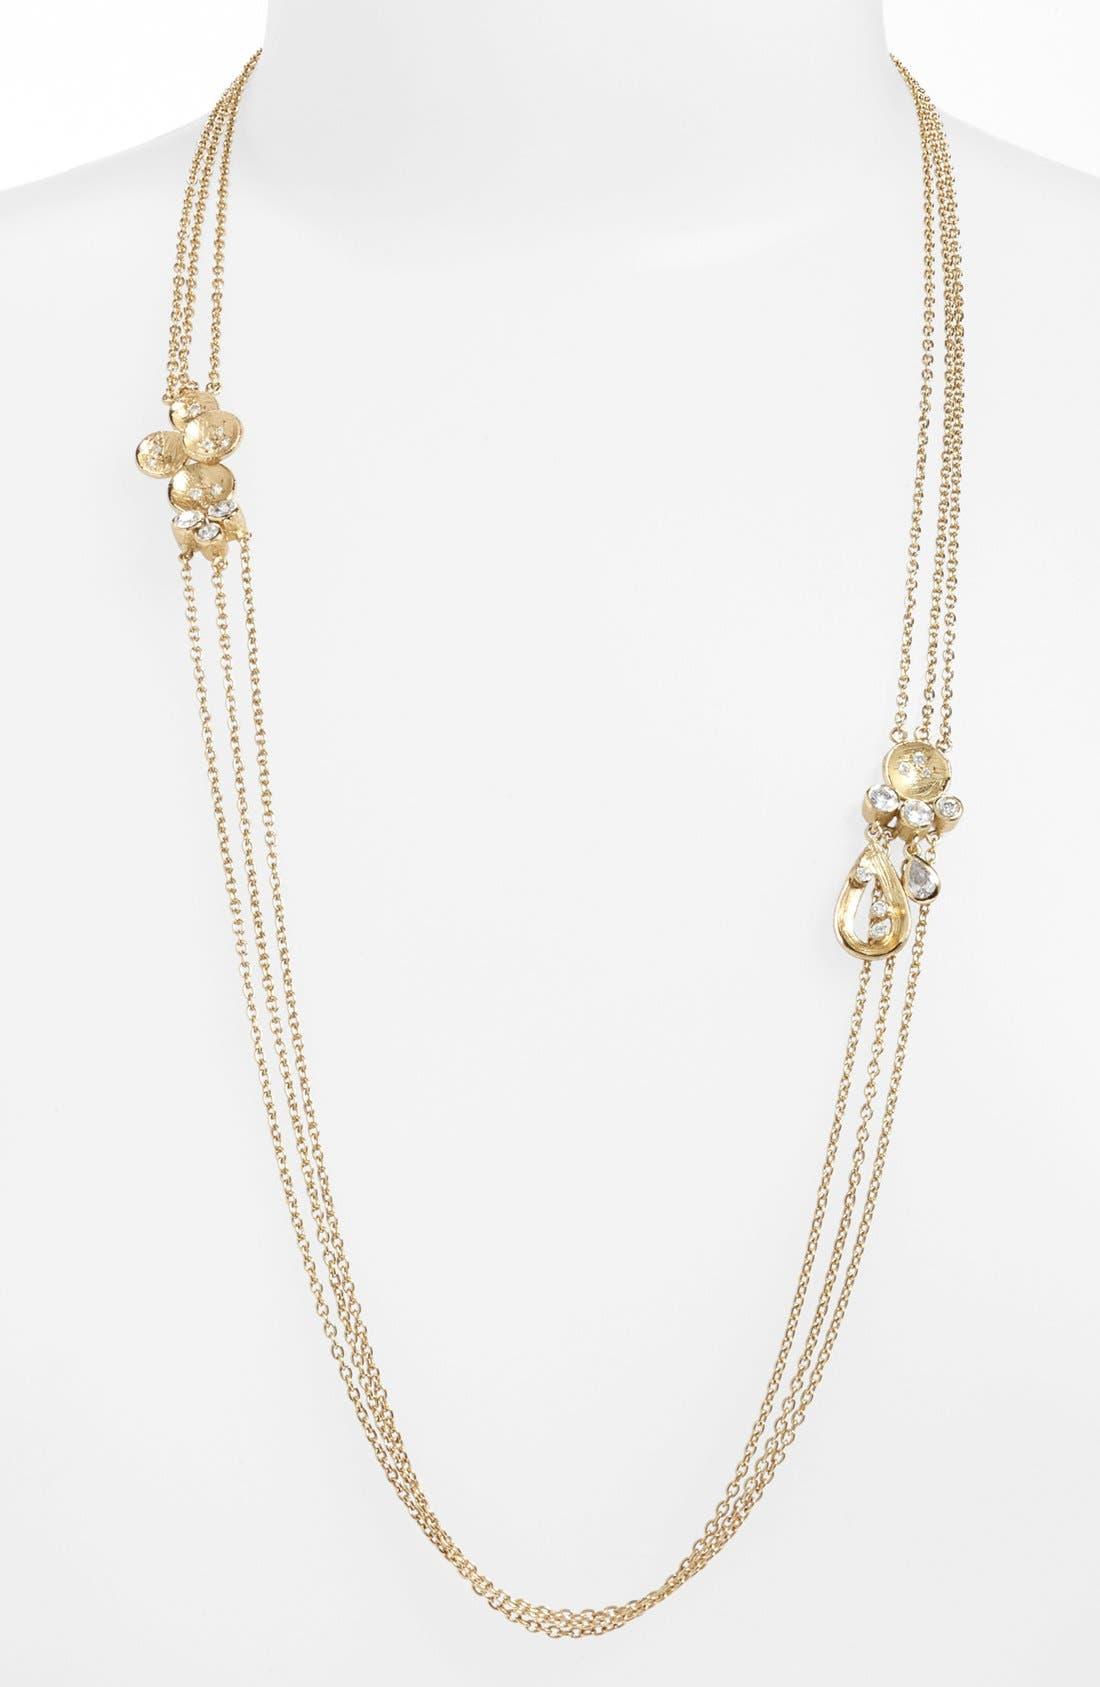 Alternate Image 1 Selected - Melinda Maria 'Hanna' Necklace